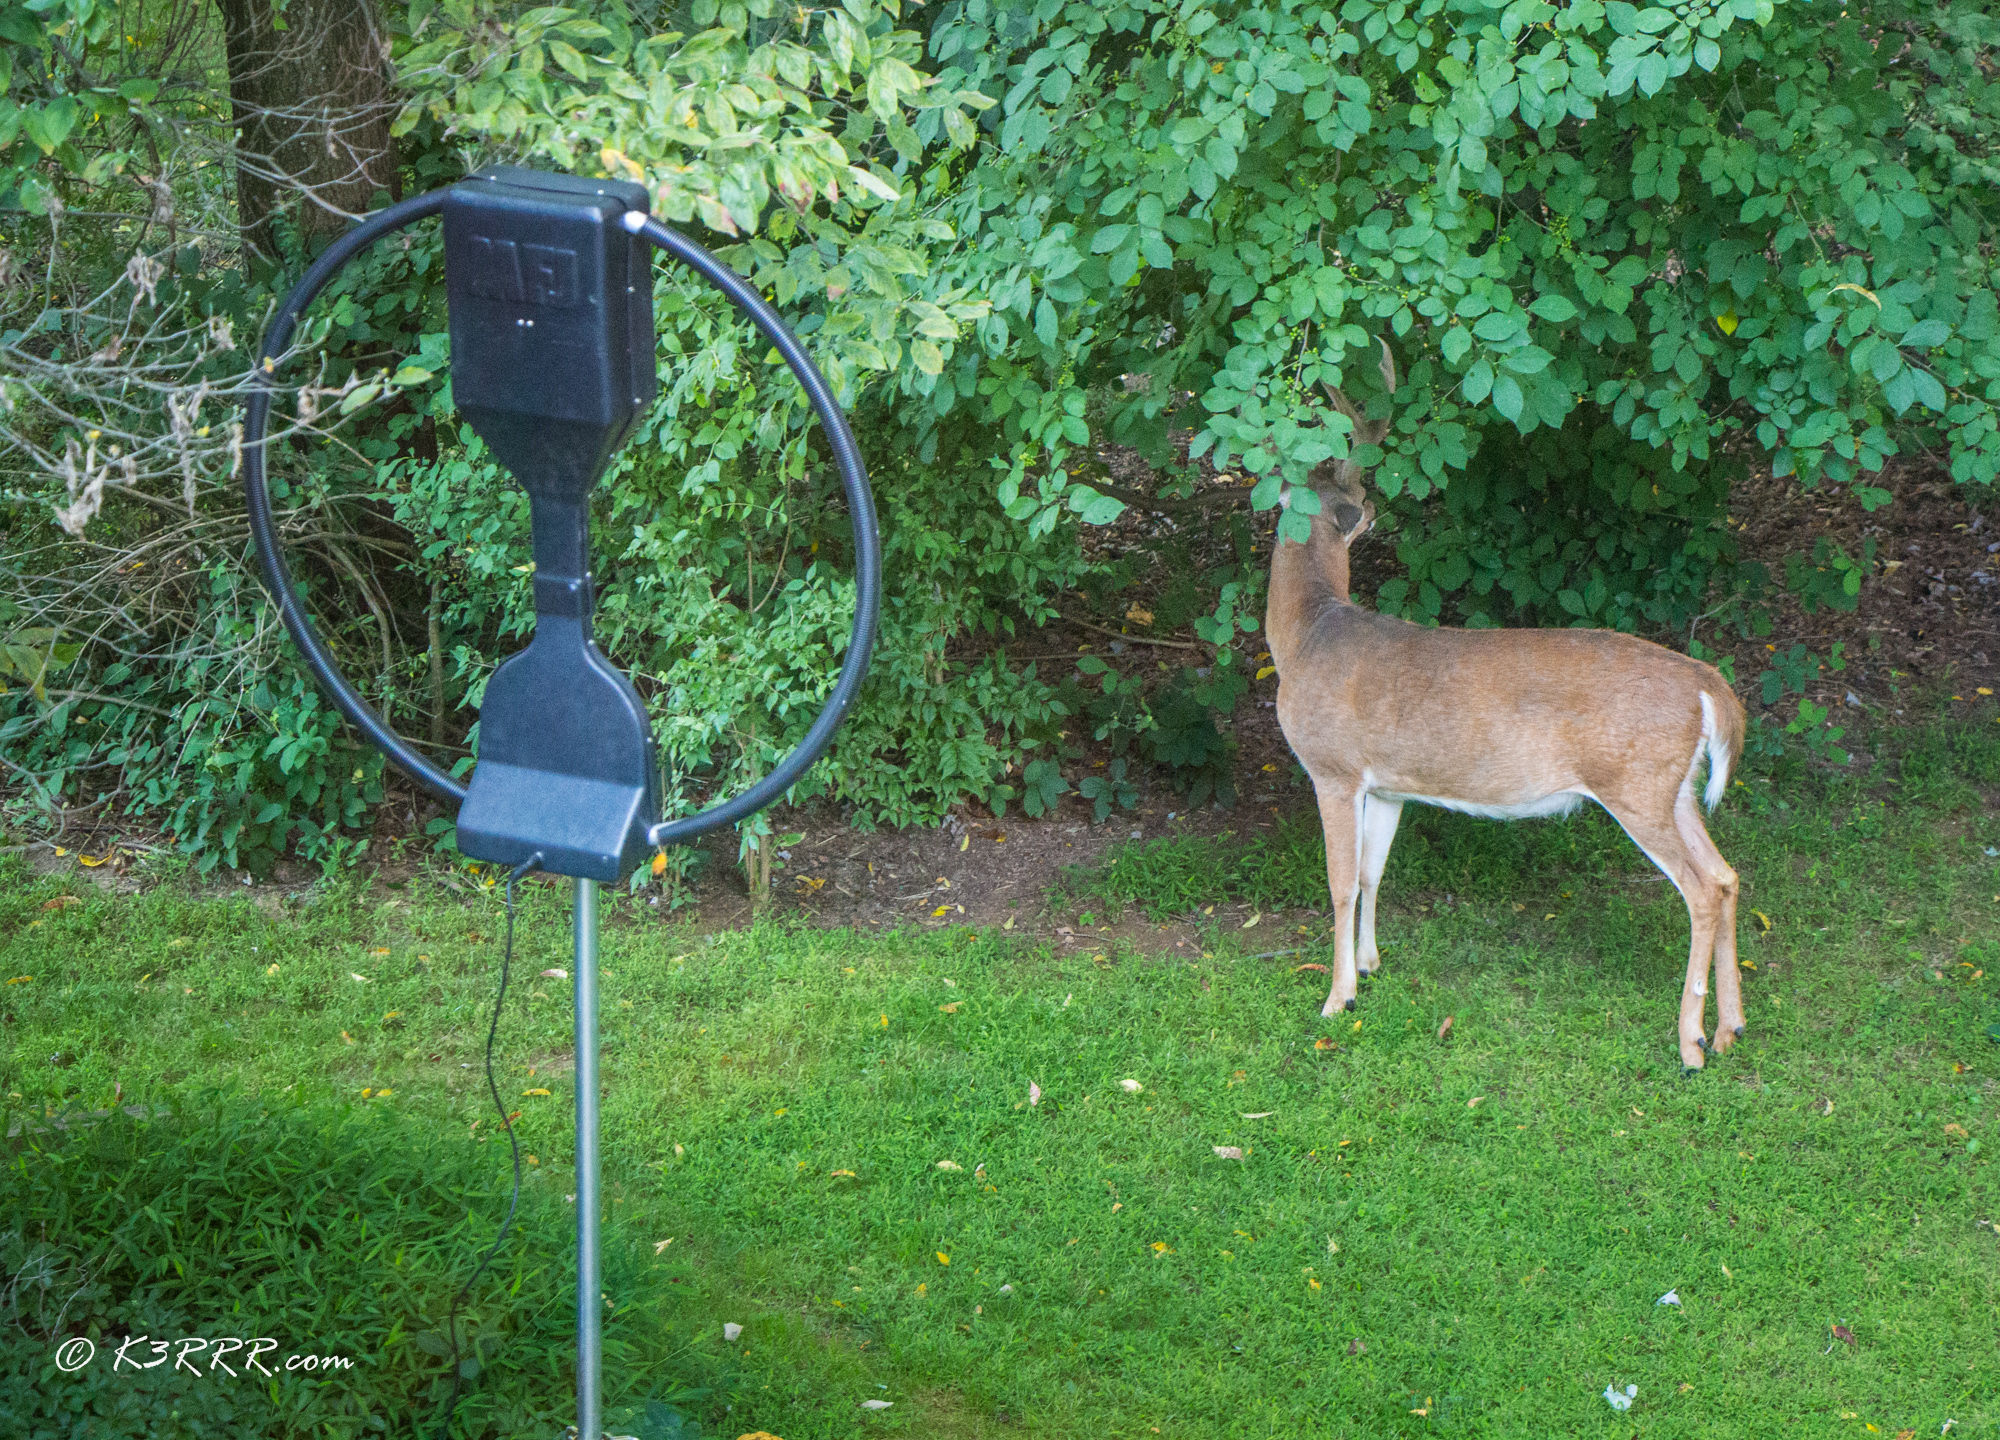 MFJ-1786 Loop Antenna - My Stealth Antenna Installations